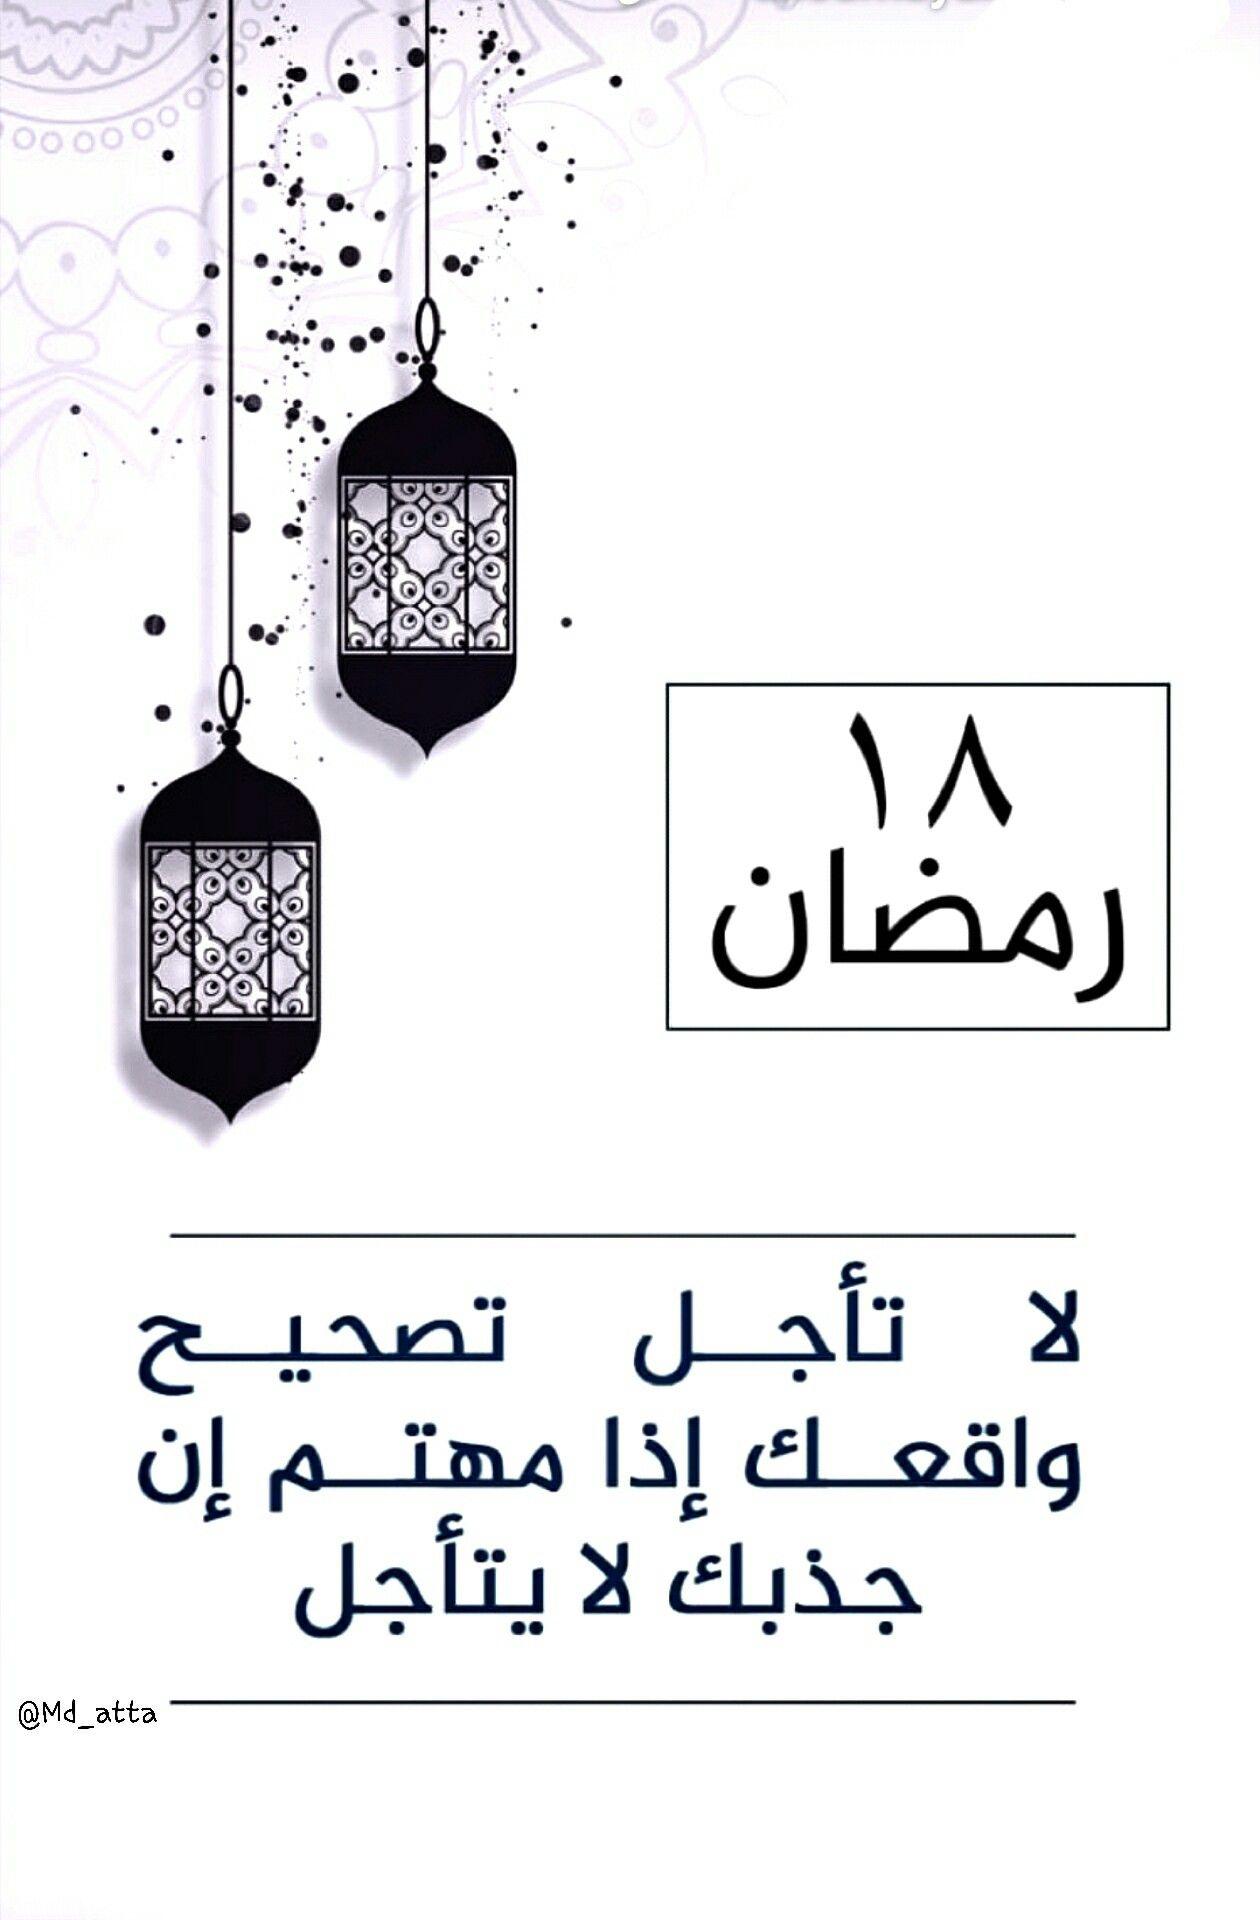 ١٨رمضان رمضان كريم Ramadan Prayer Ramadan Islamic Images